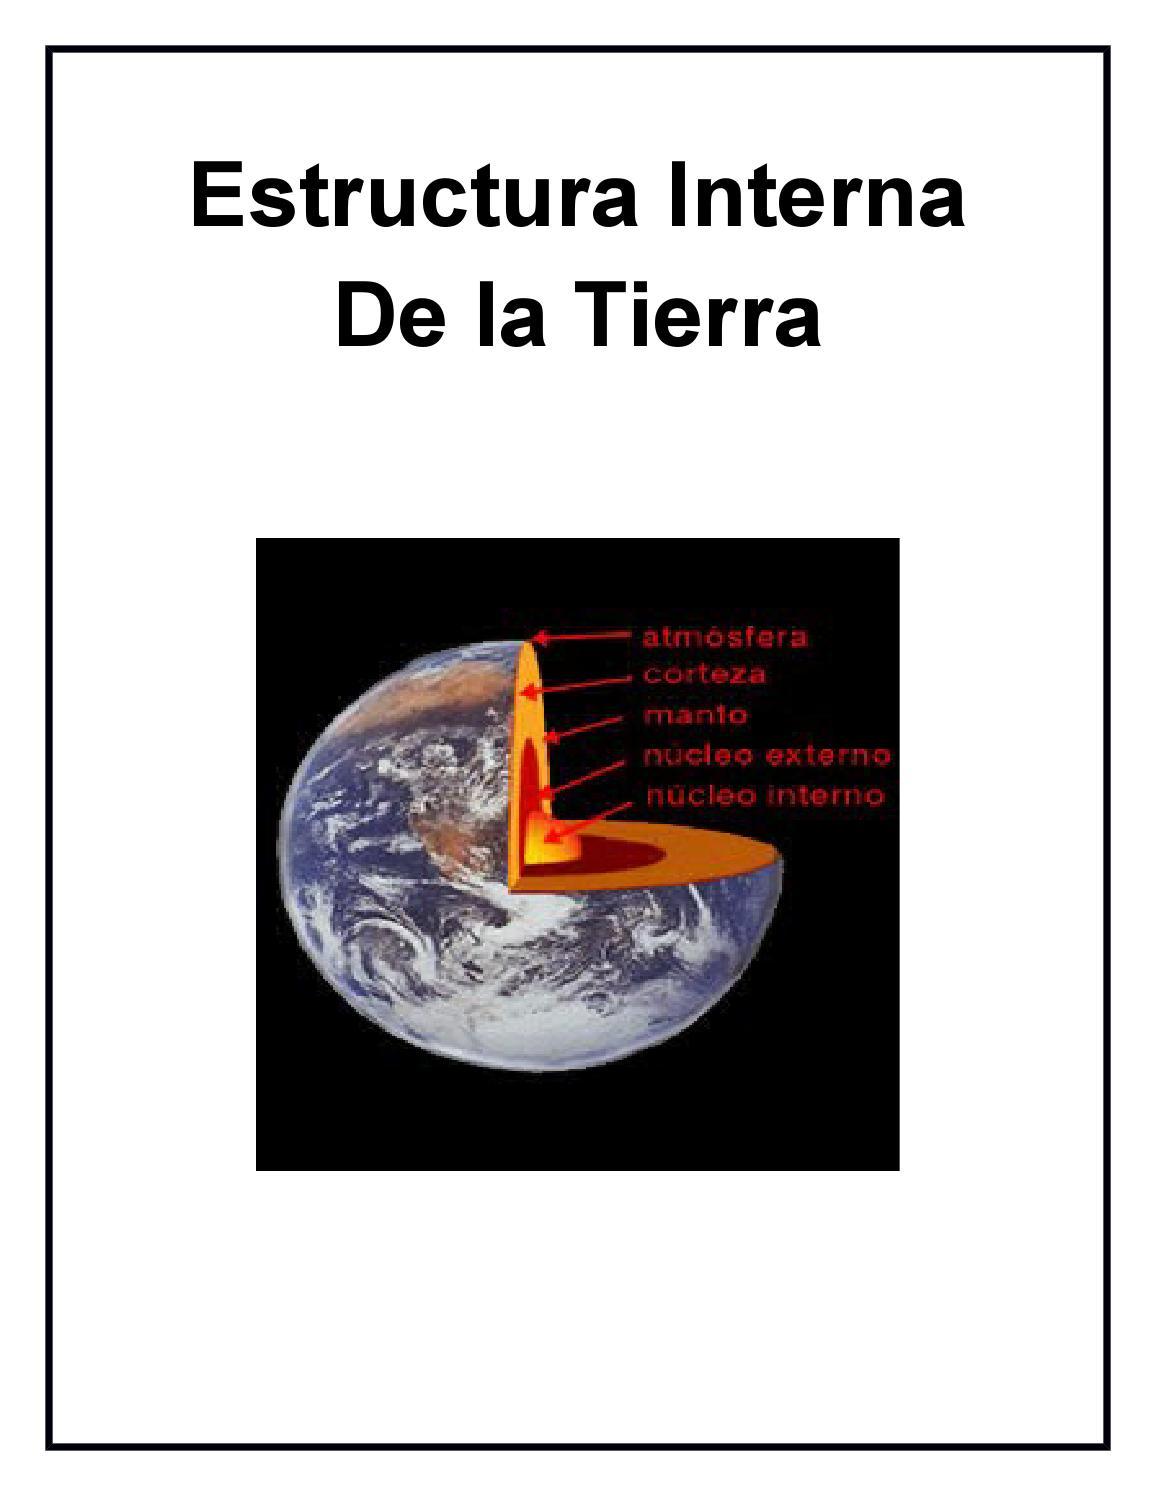 Estructura Interna De La Tierra 1 By Gipava Issuu